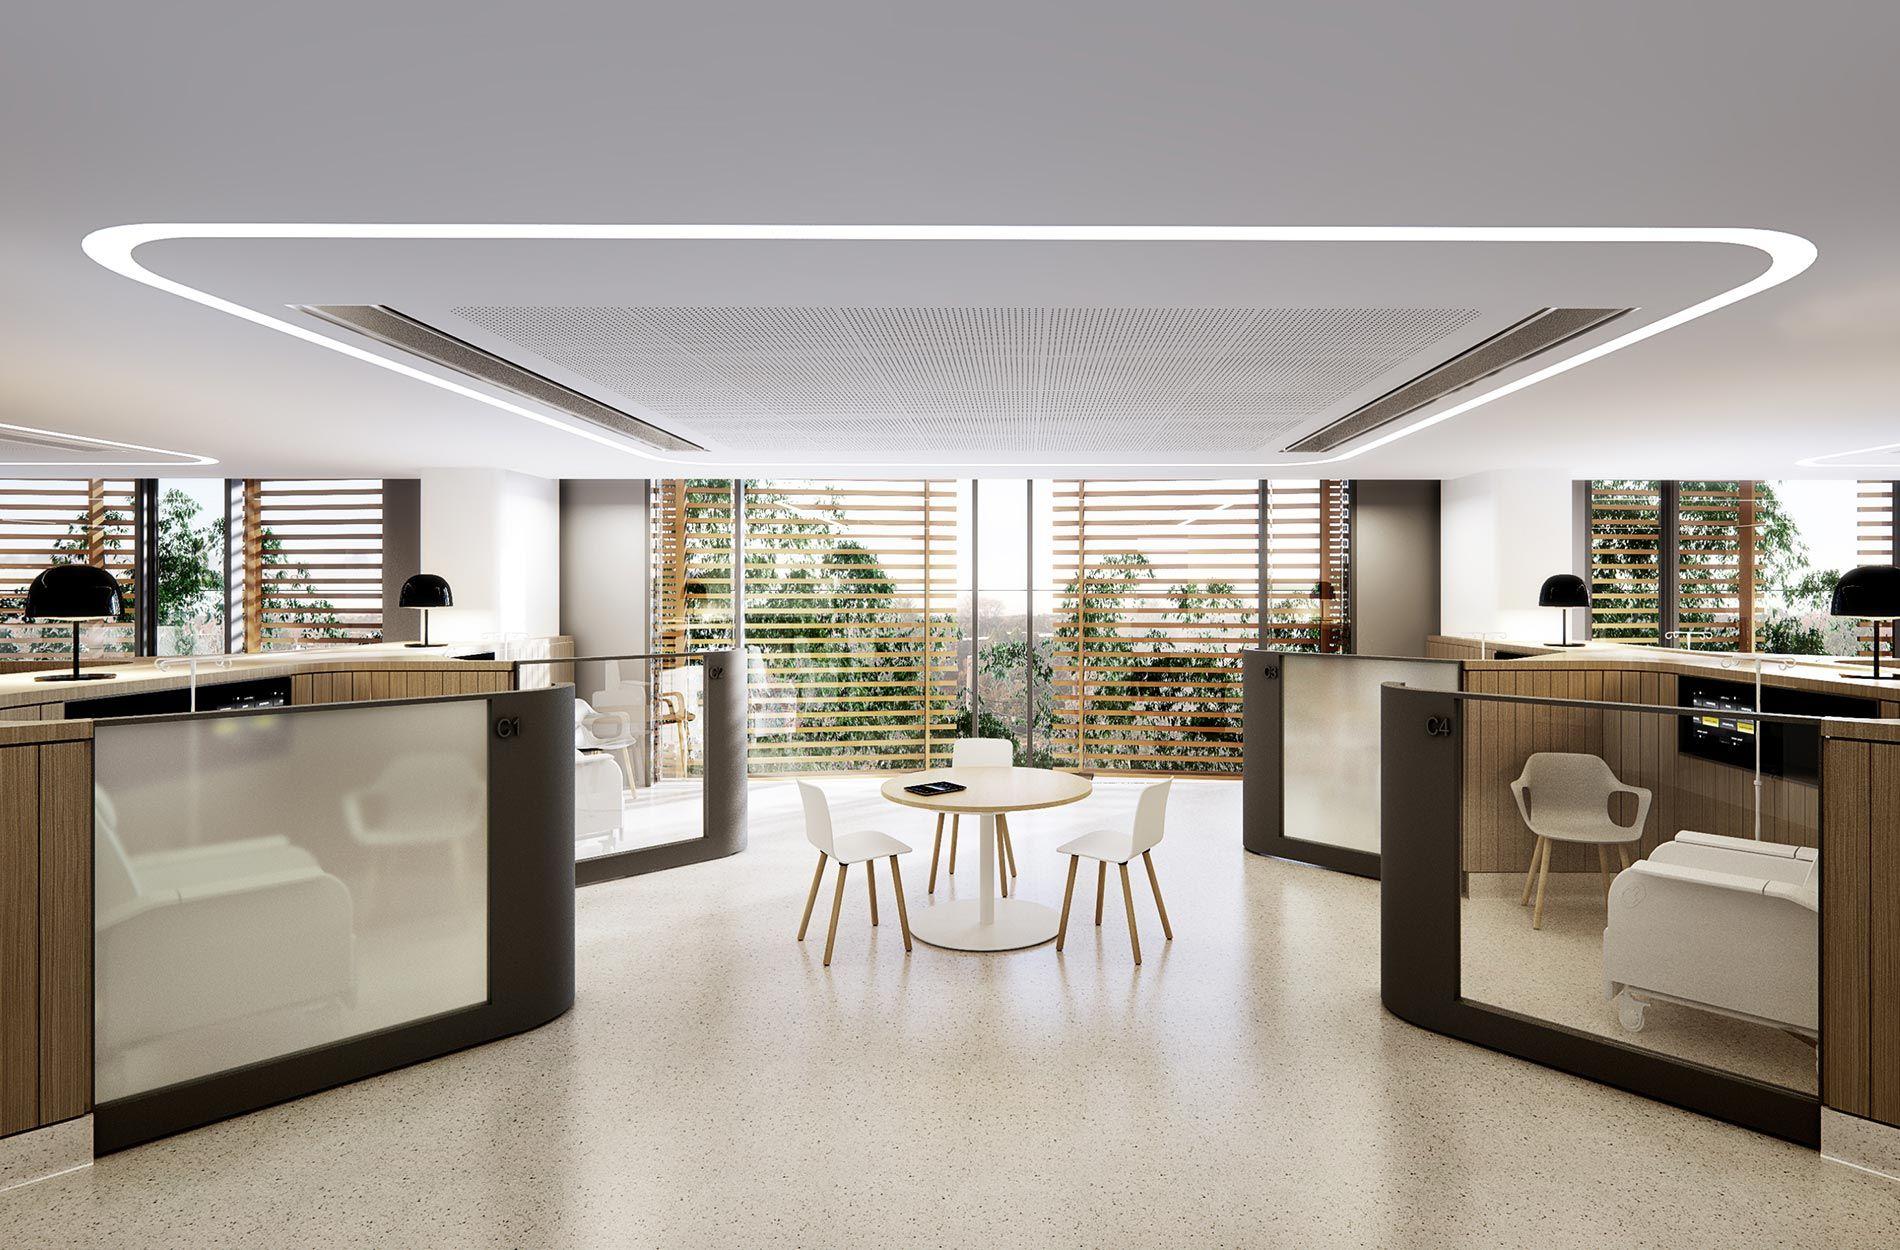 New Clinical Building Cabrini Hospital Bates Smart